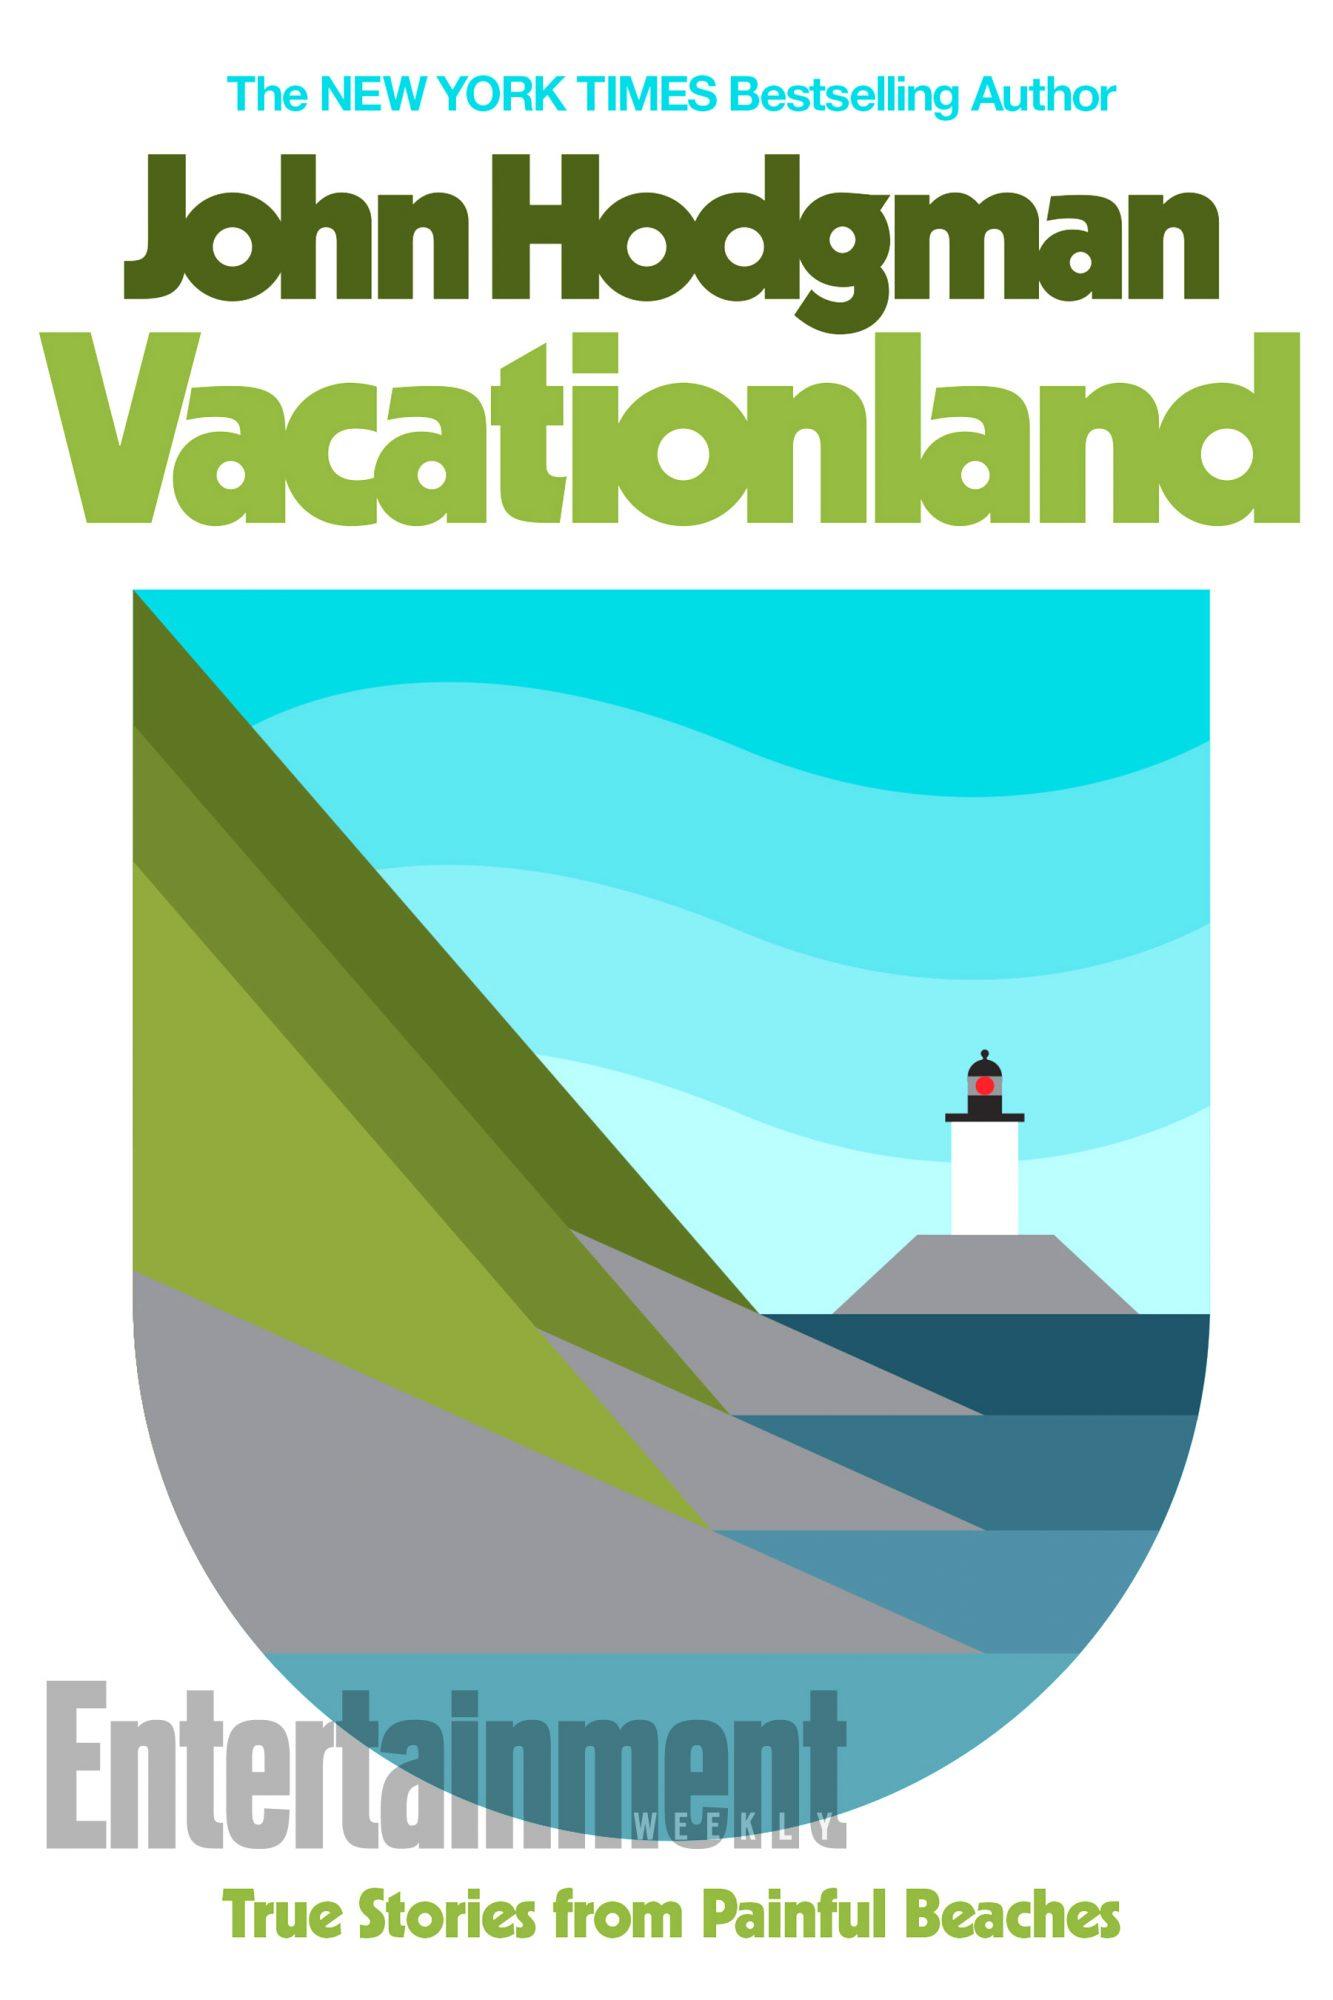 HODGMAN_VACATIONLAND_round6